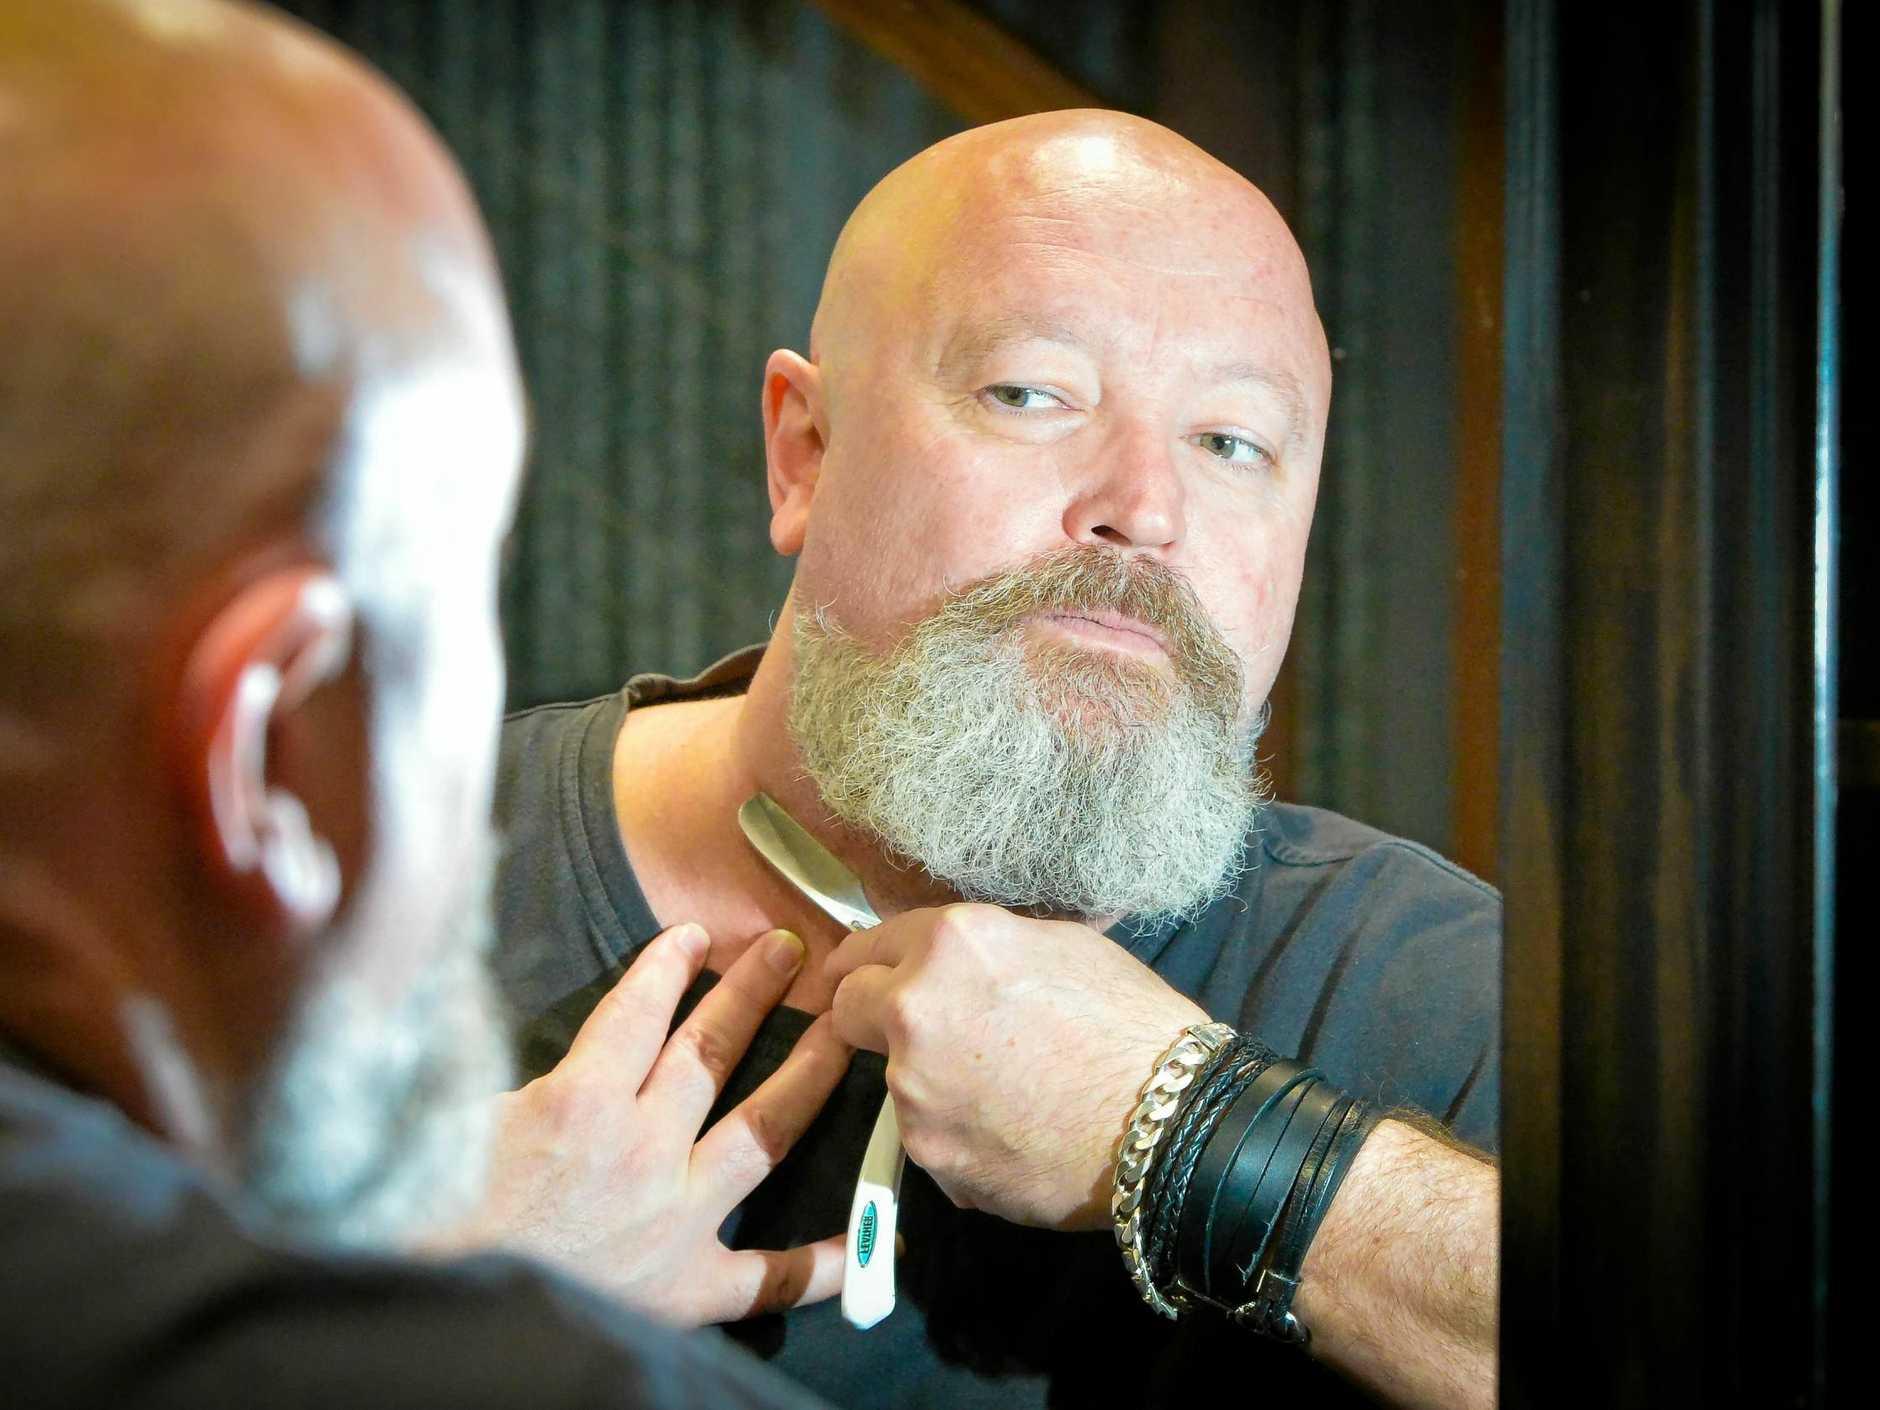 CUTTING EDGE: Rex Silver of The Garage Barber Shop